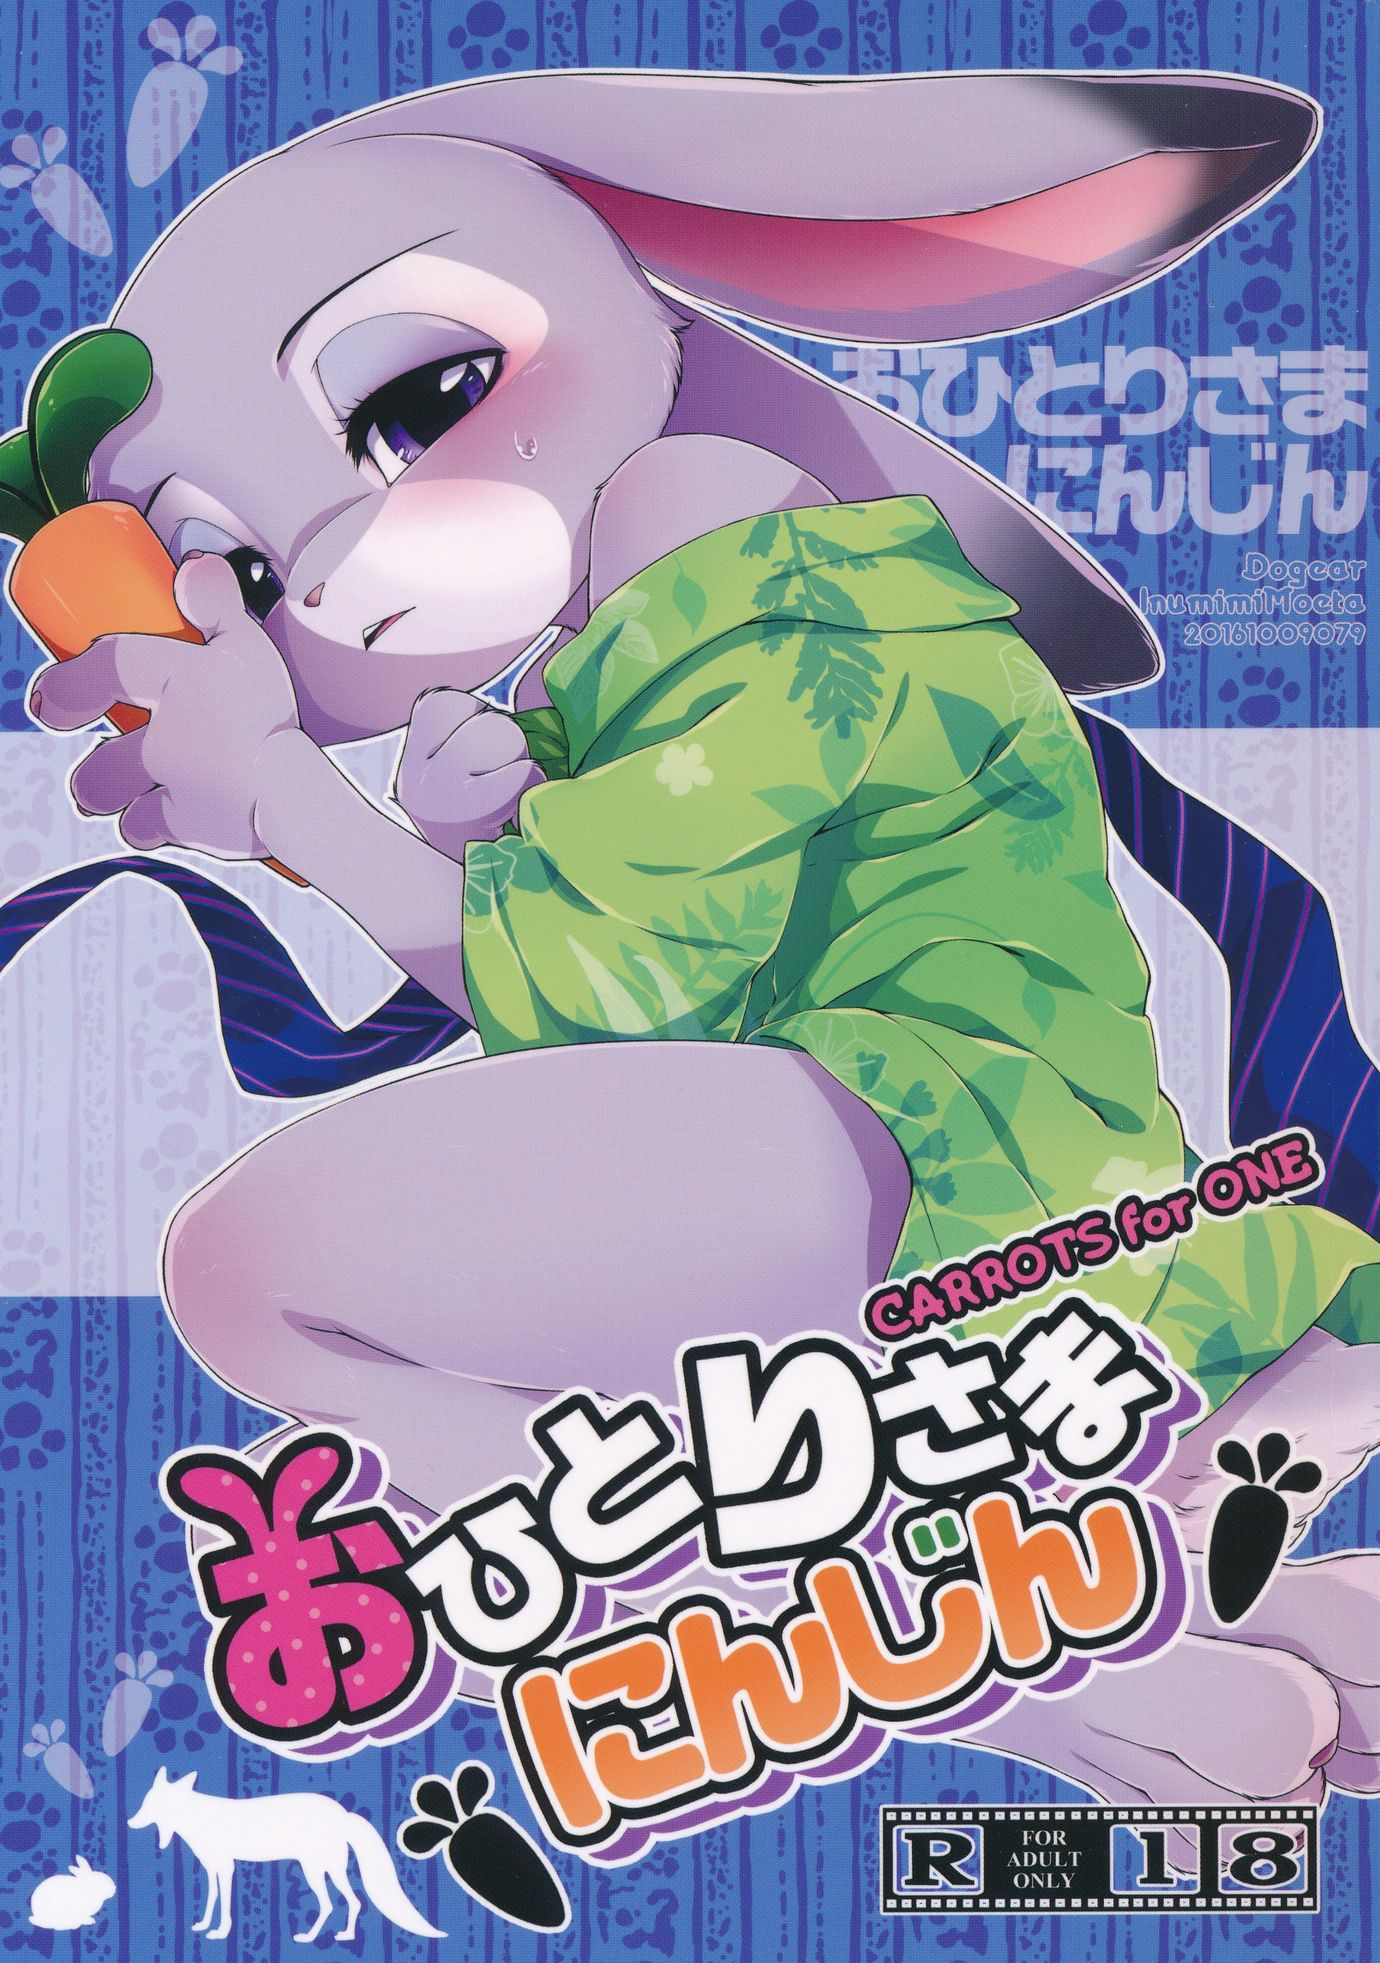 Goodcomix.tk Zootopia - [Dogear (Inumimi Moeta)] - Carrots For One